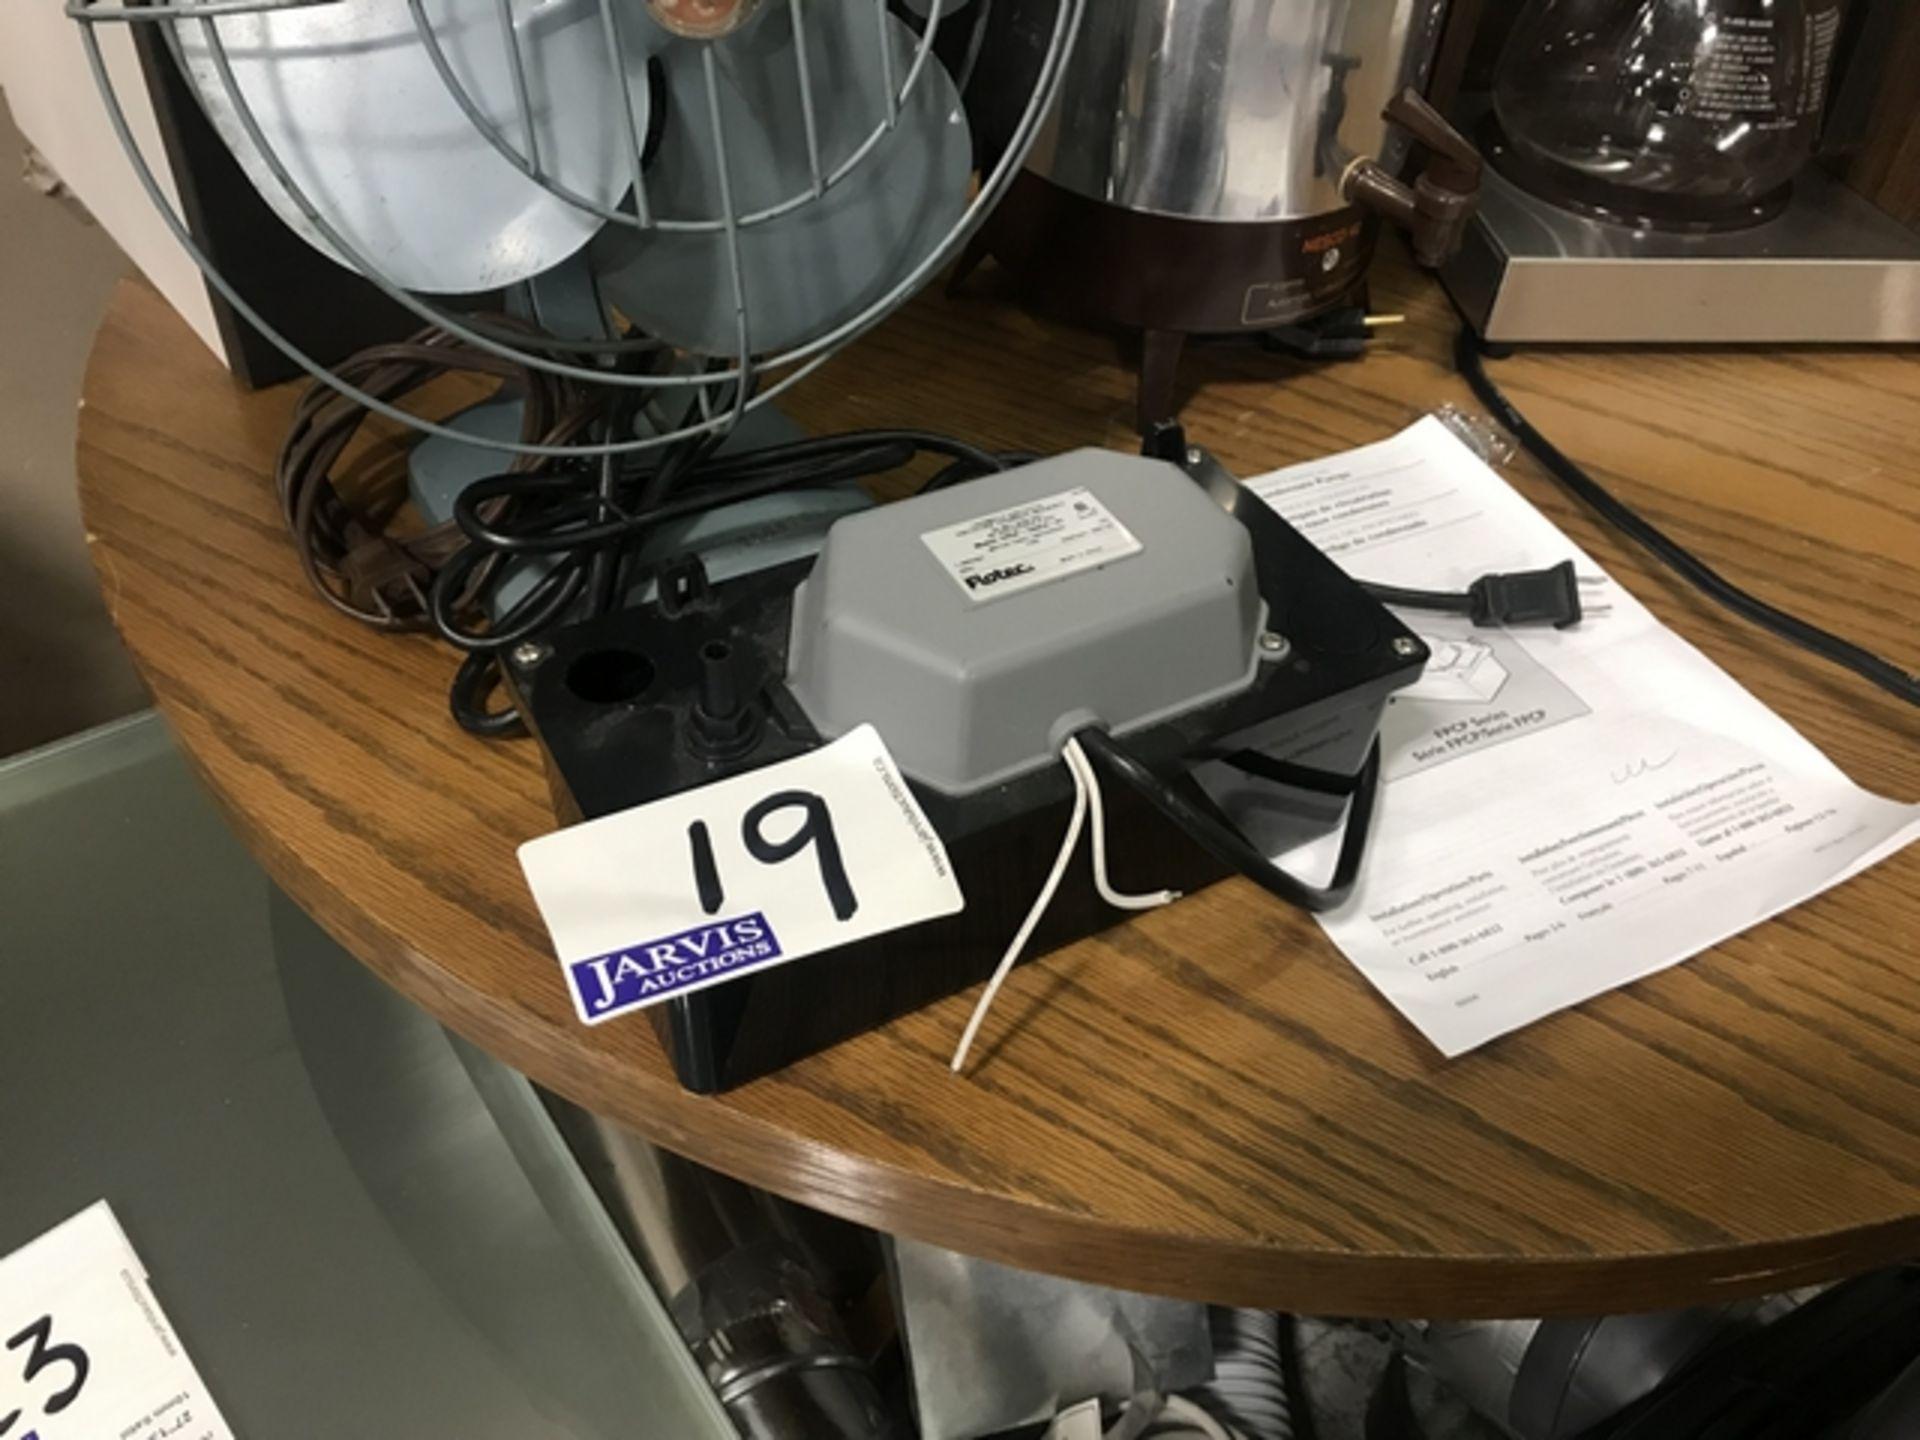 Lot 19 - FLOTEC CONDENSATE PUMP